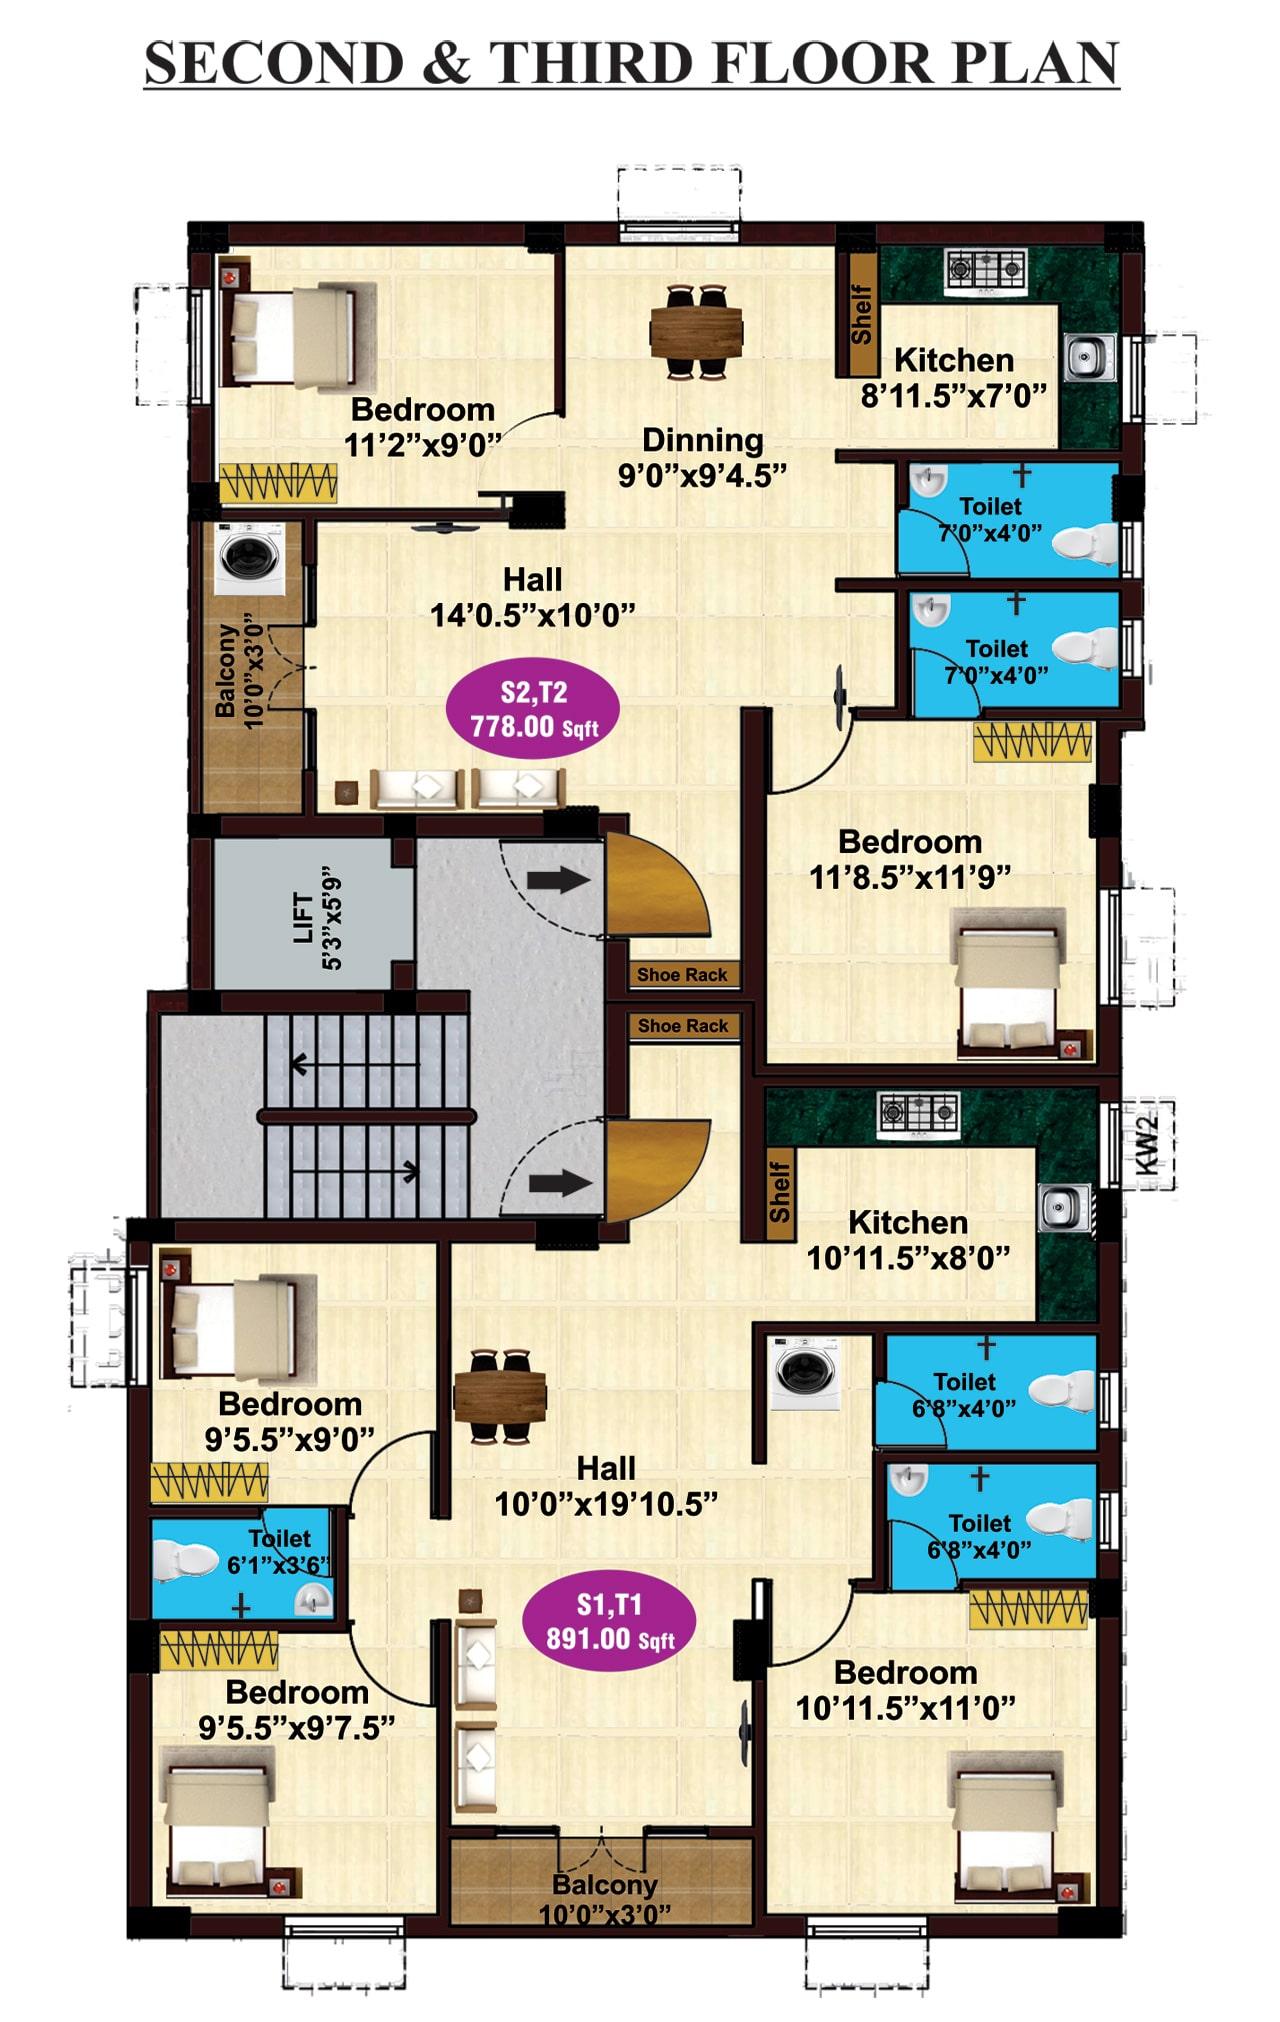 jkb-siddharth-enclave-2nd-3rd-floor-plan